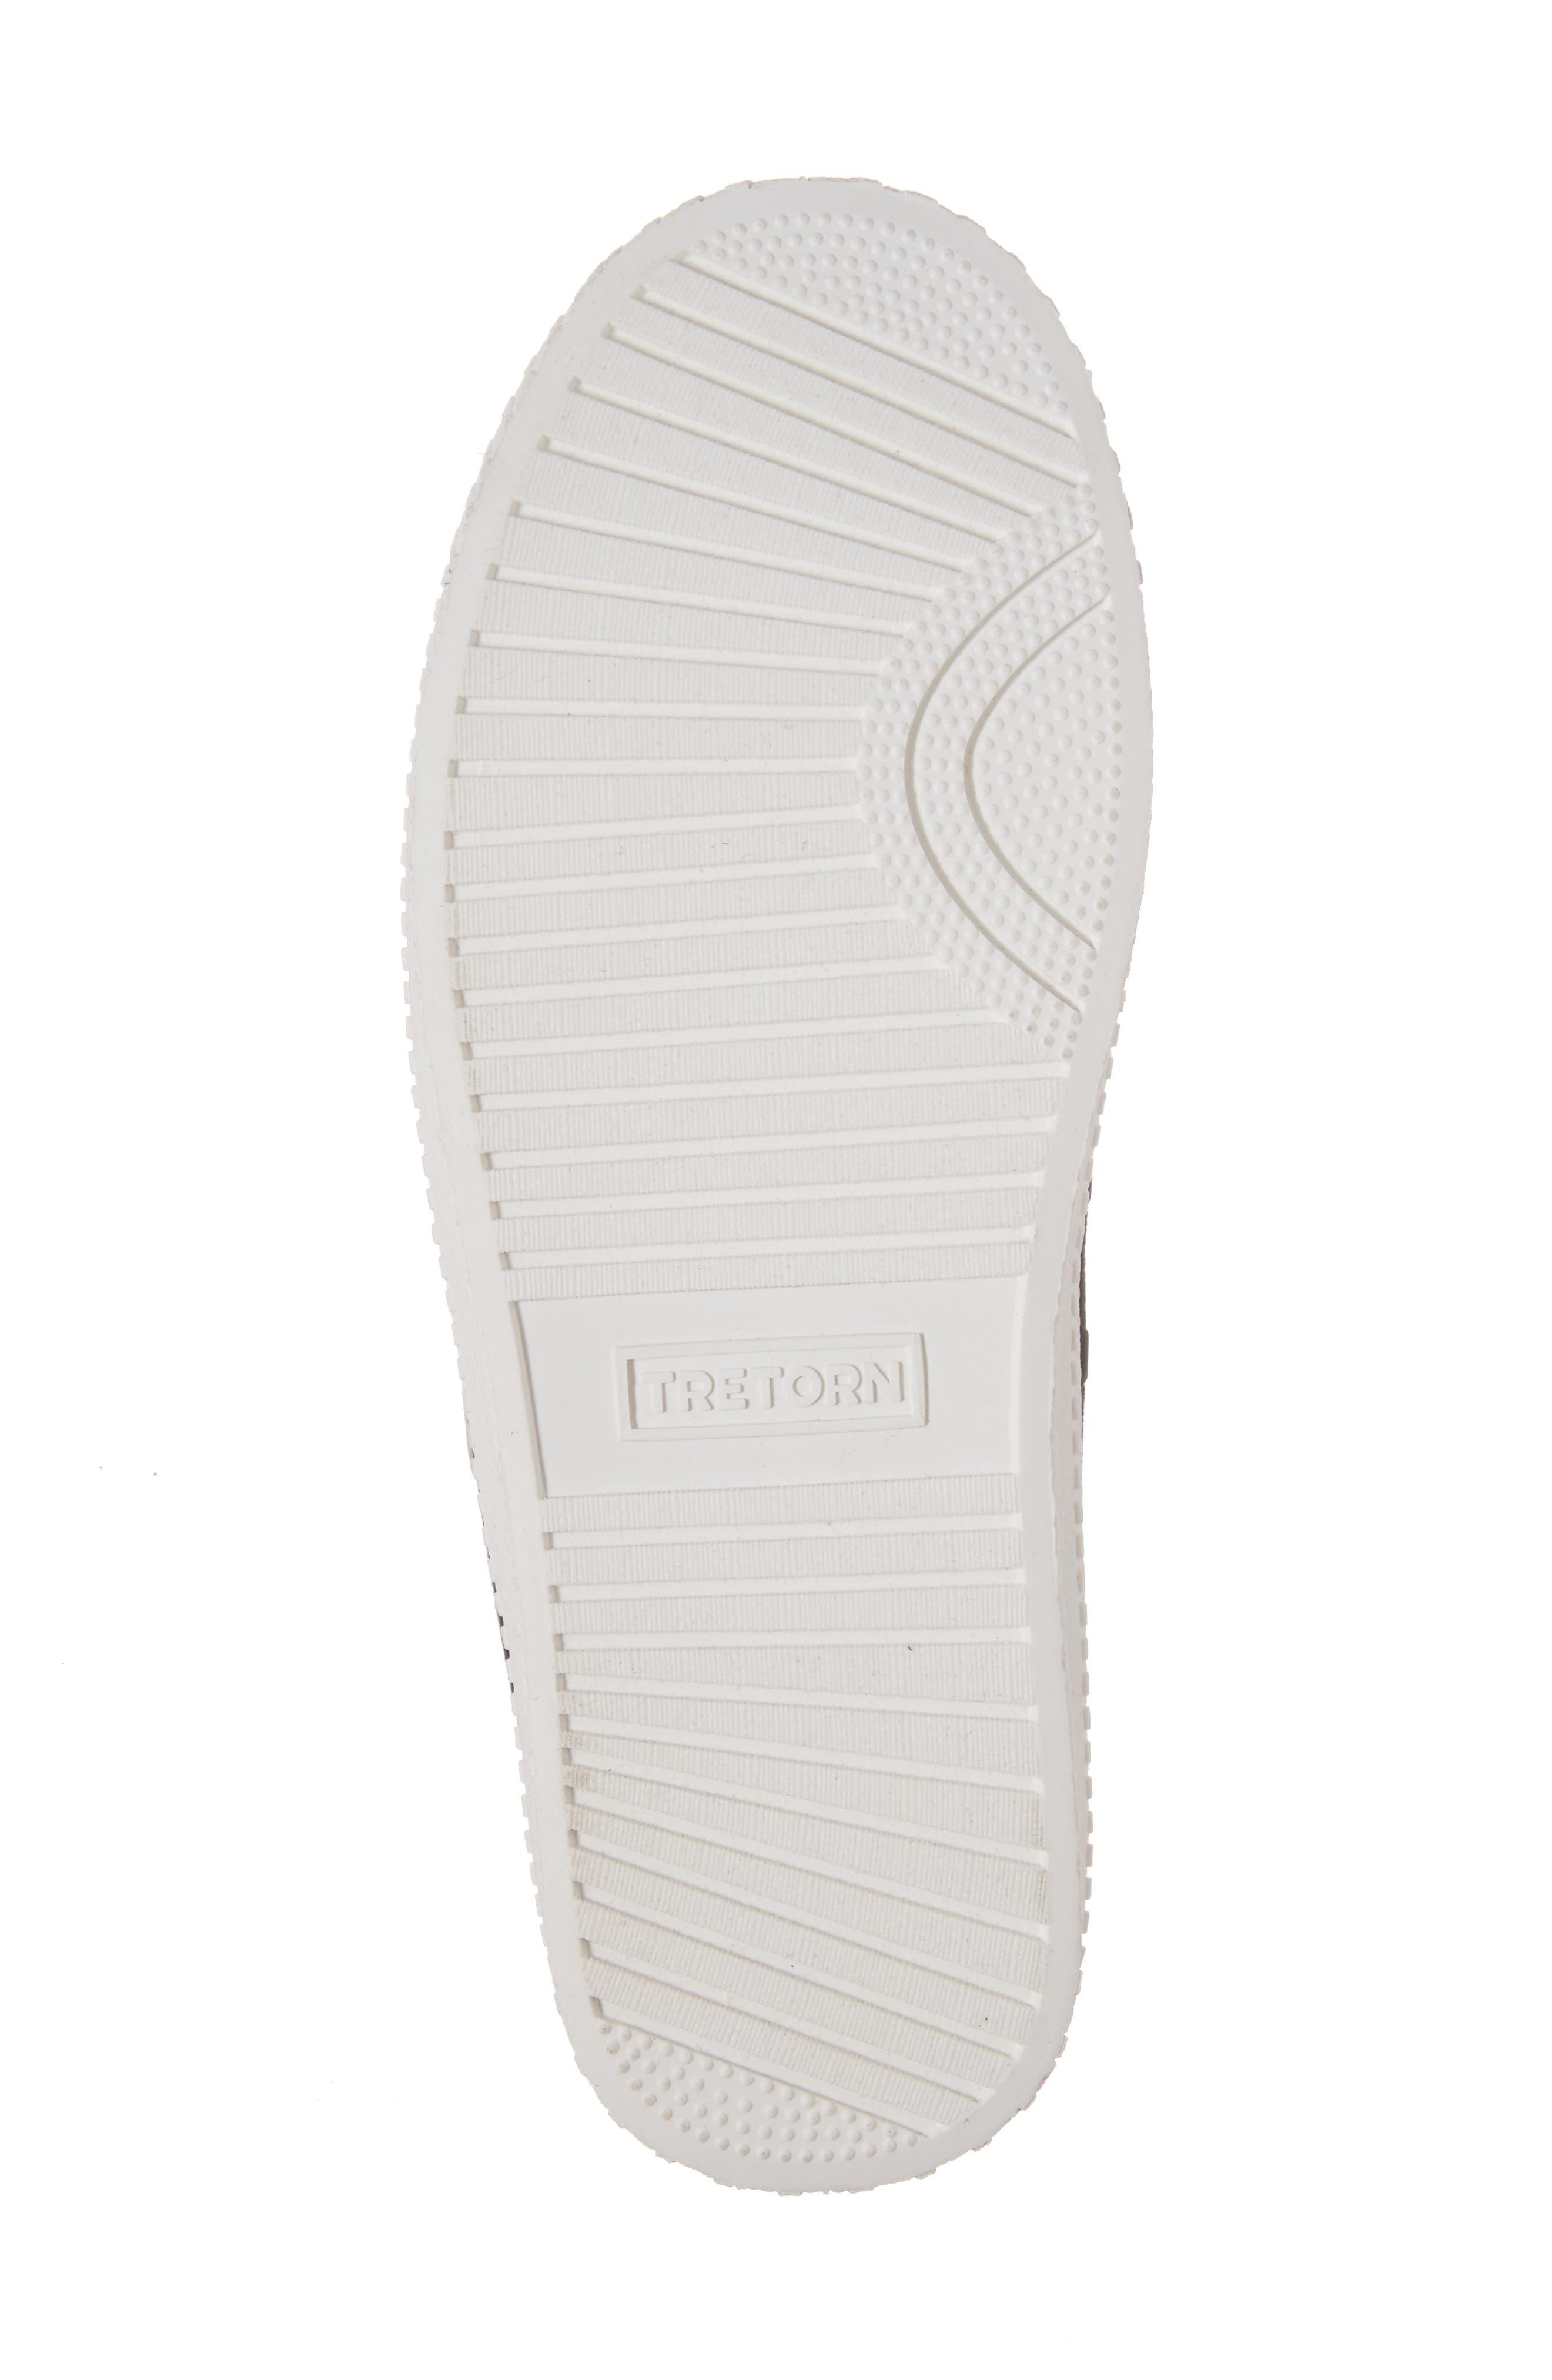 TRETORN, Nylite Plus Sneaker, Alternate thumbnail 6, color, 012